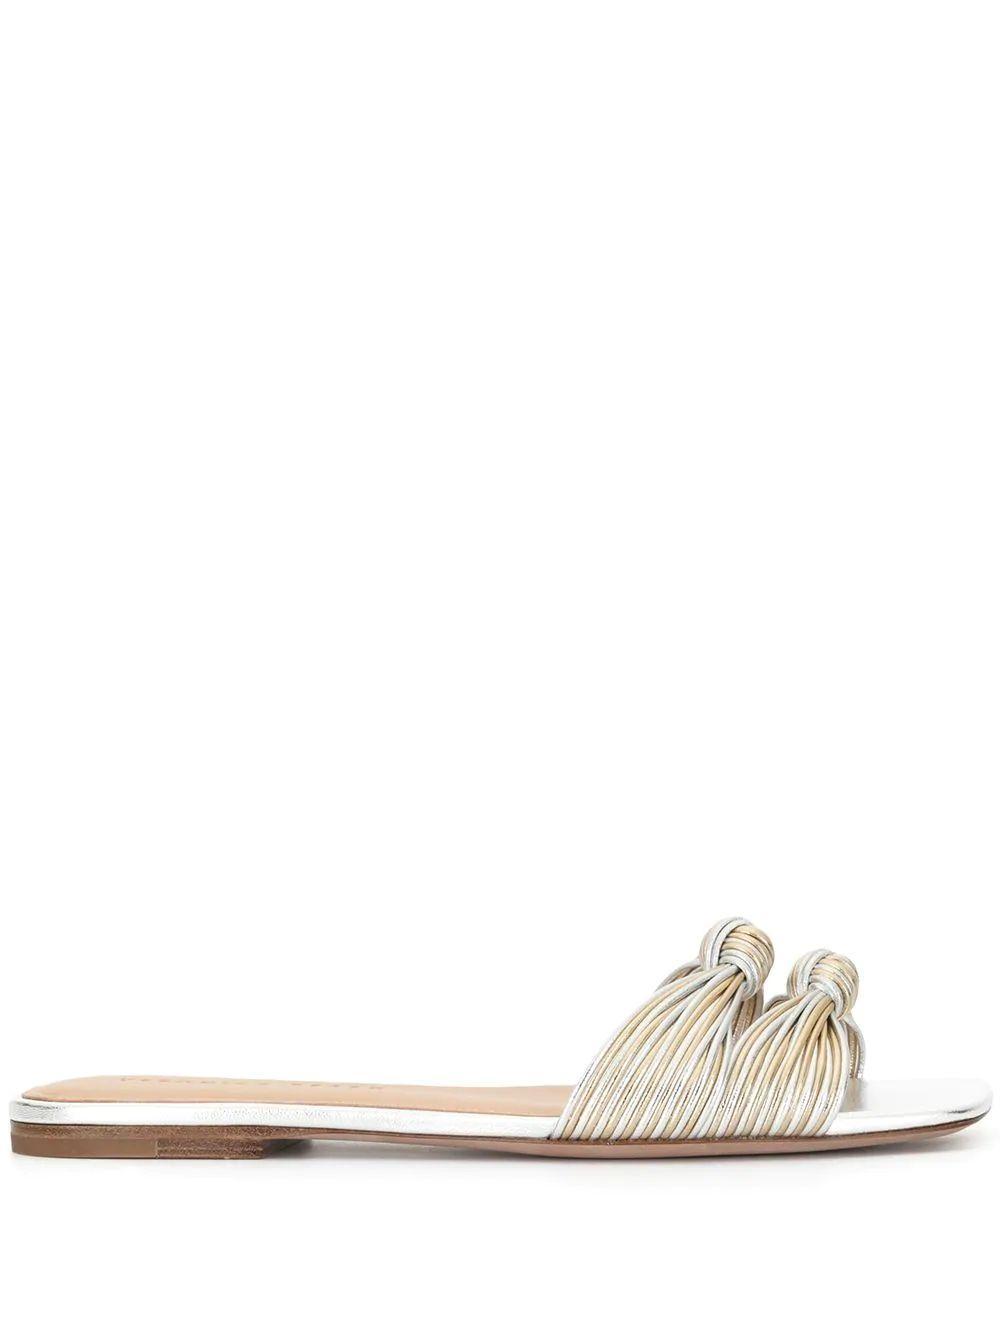 Gemma Knot Slide Sandal